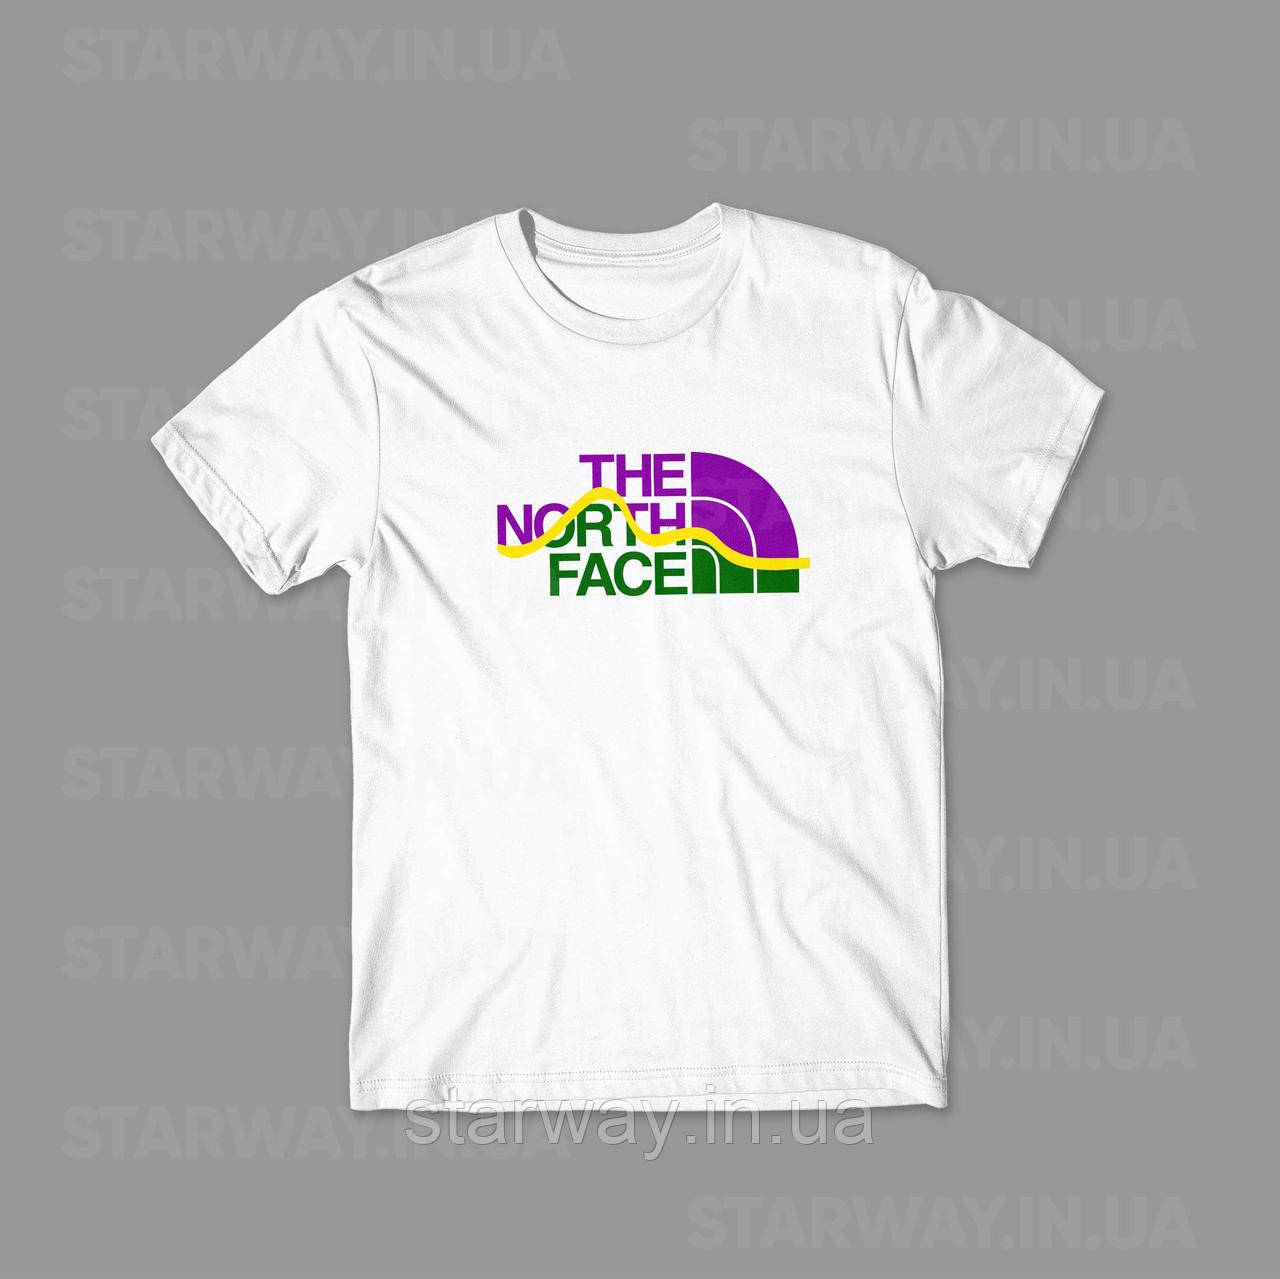 Футболка стильная The North Face mega logo